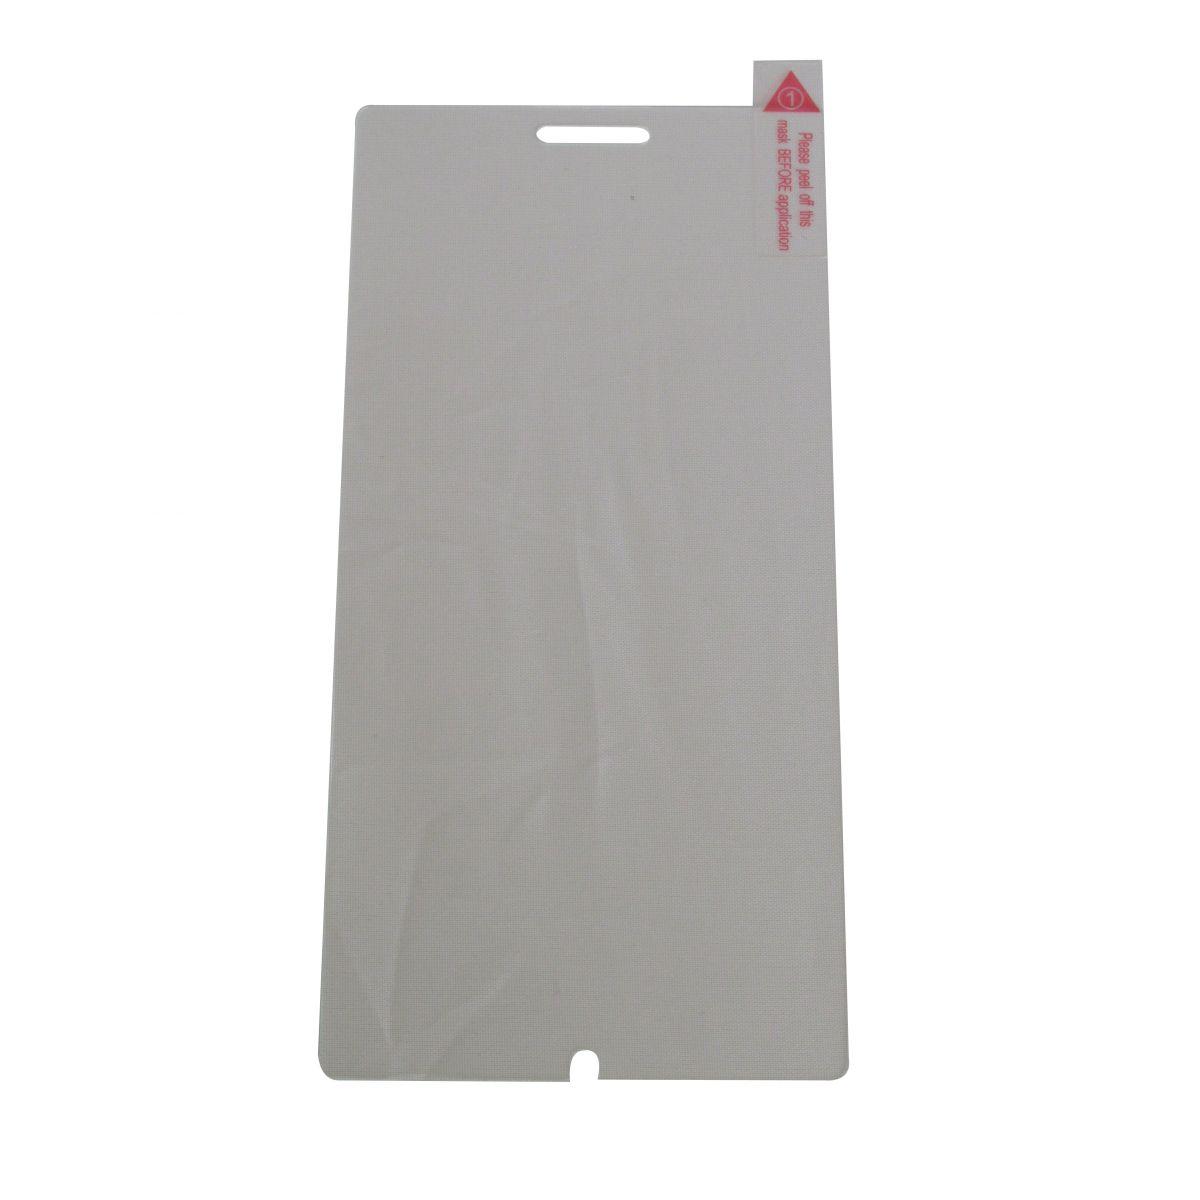 Pelicula De Vidro Temperado Nokia Lumia 830